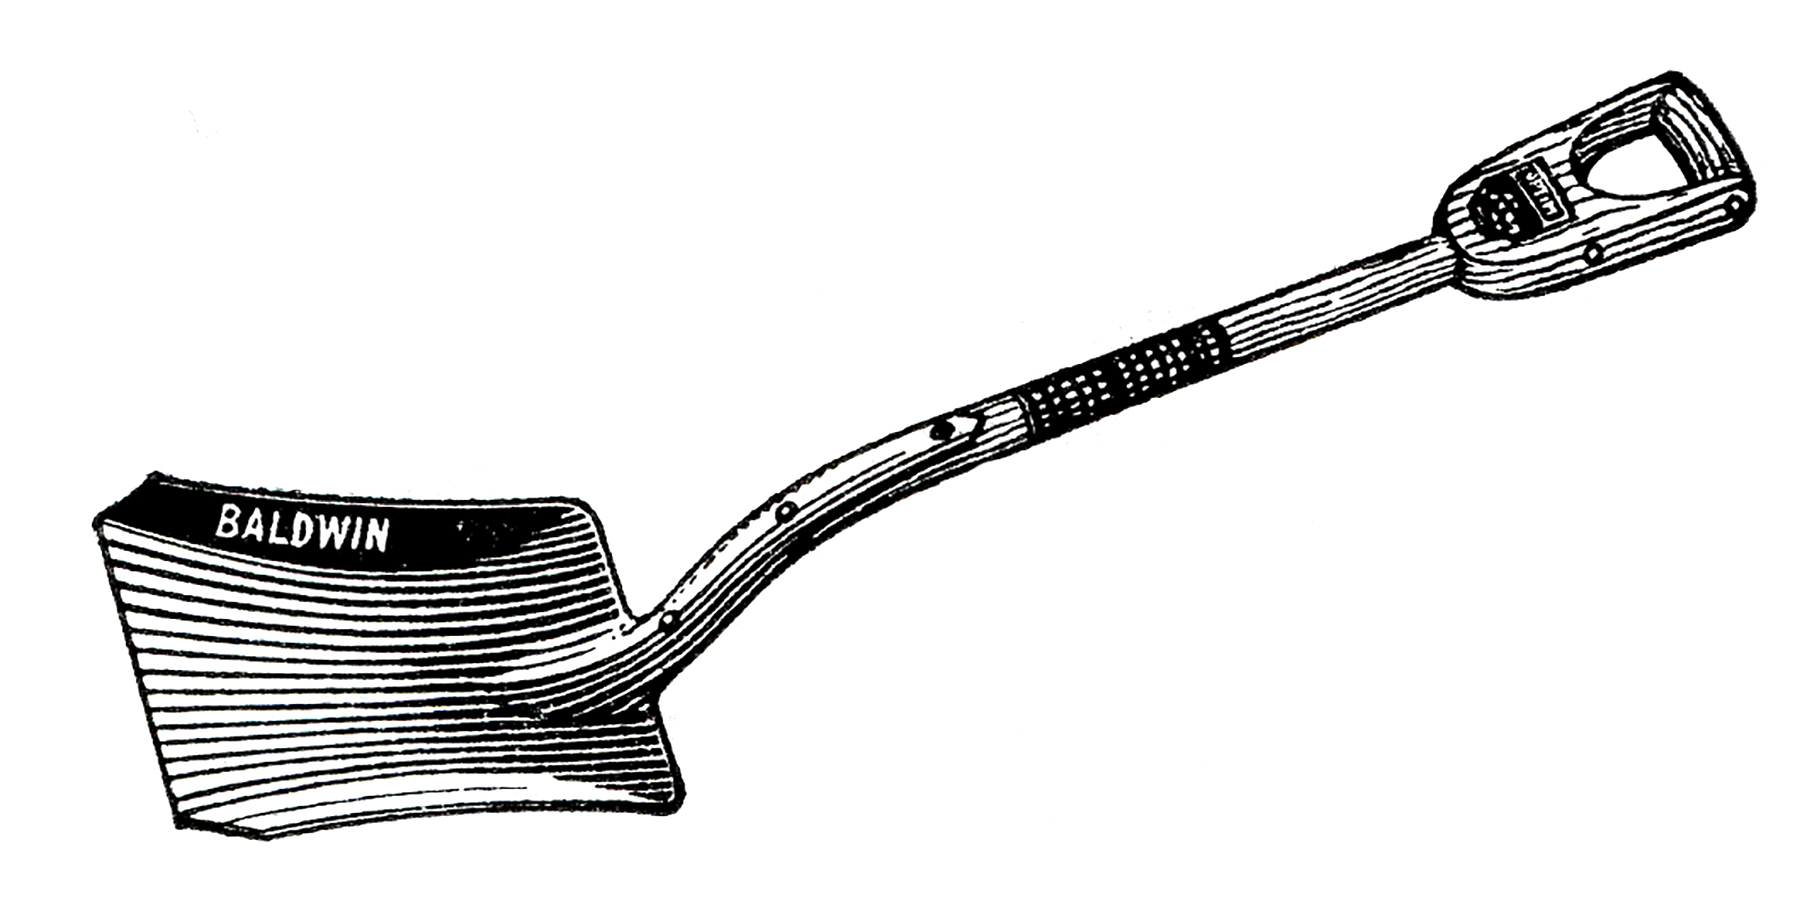 free vintage shovel clip art images the graphics fairy shovel clip art black shovel clip art images